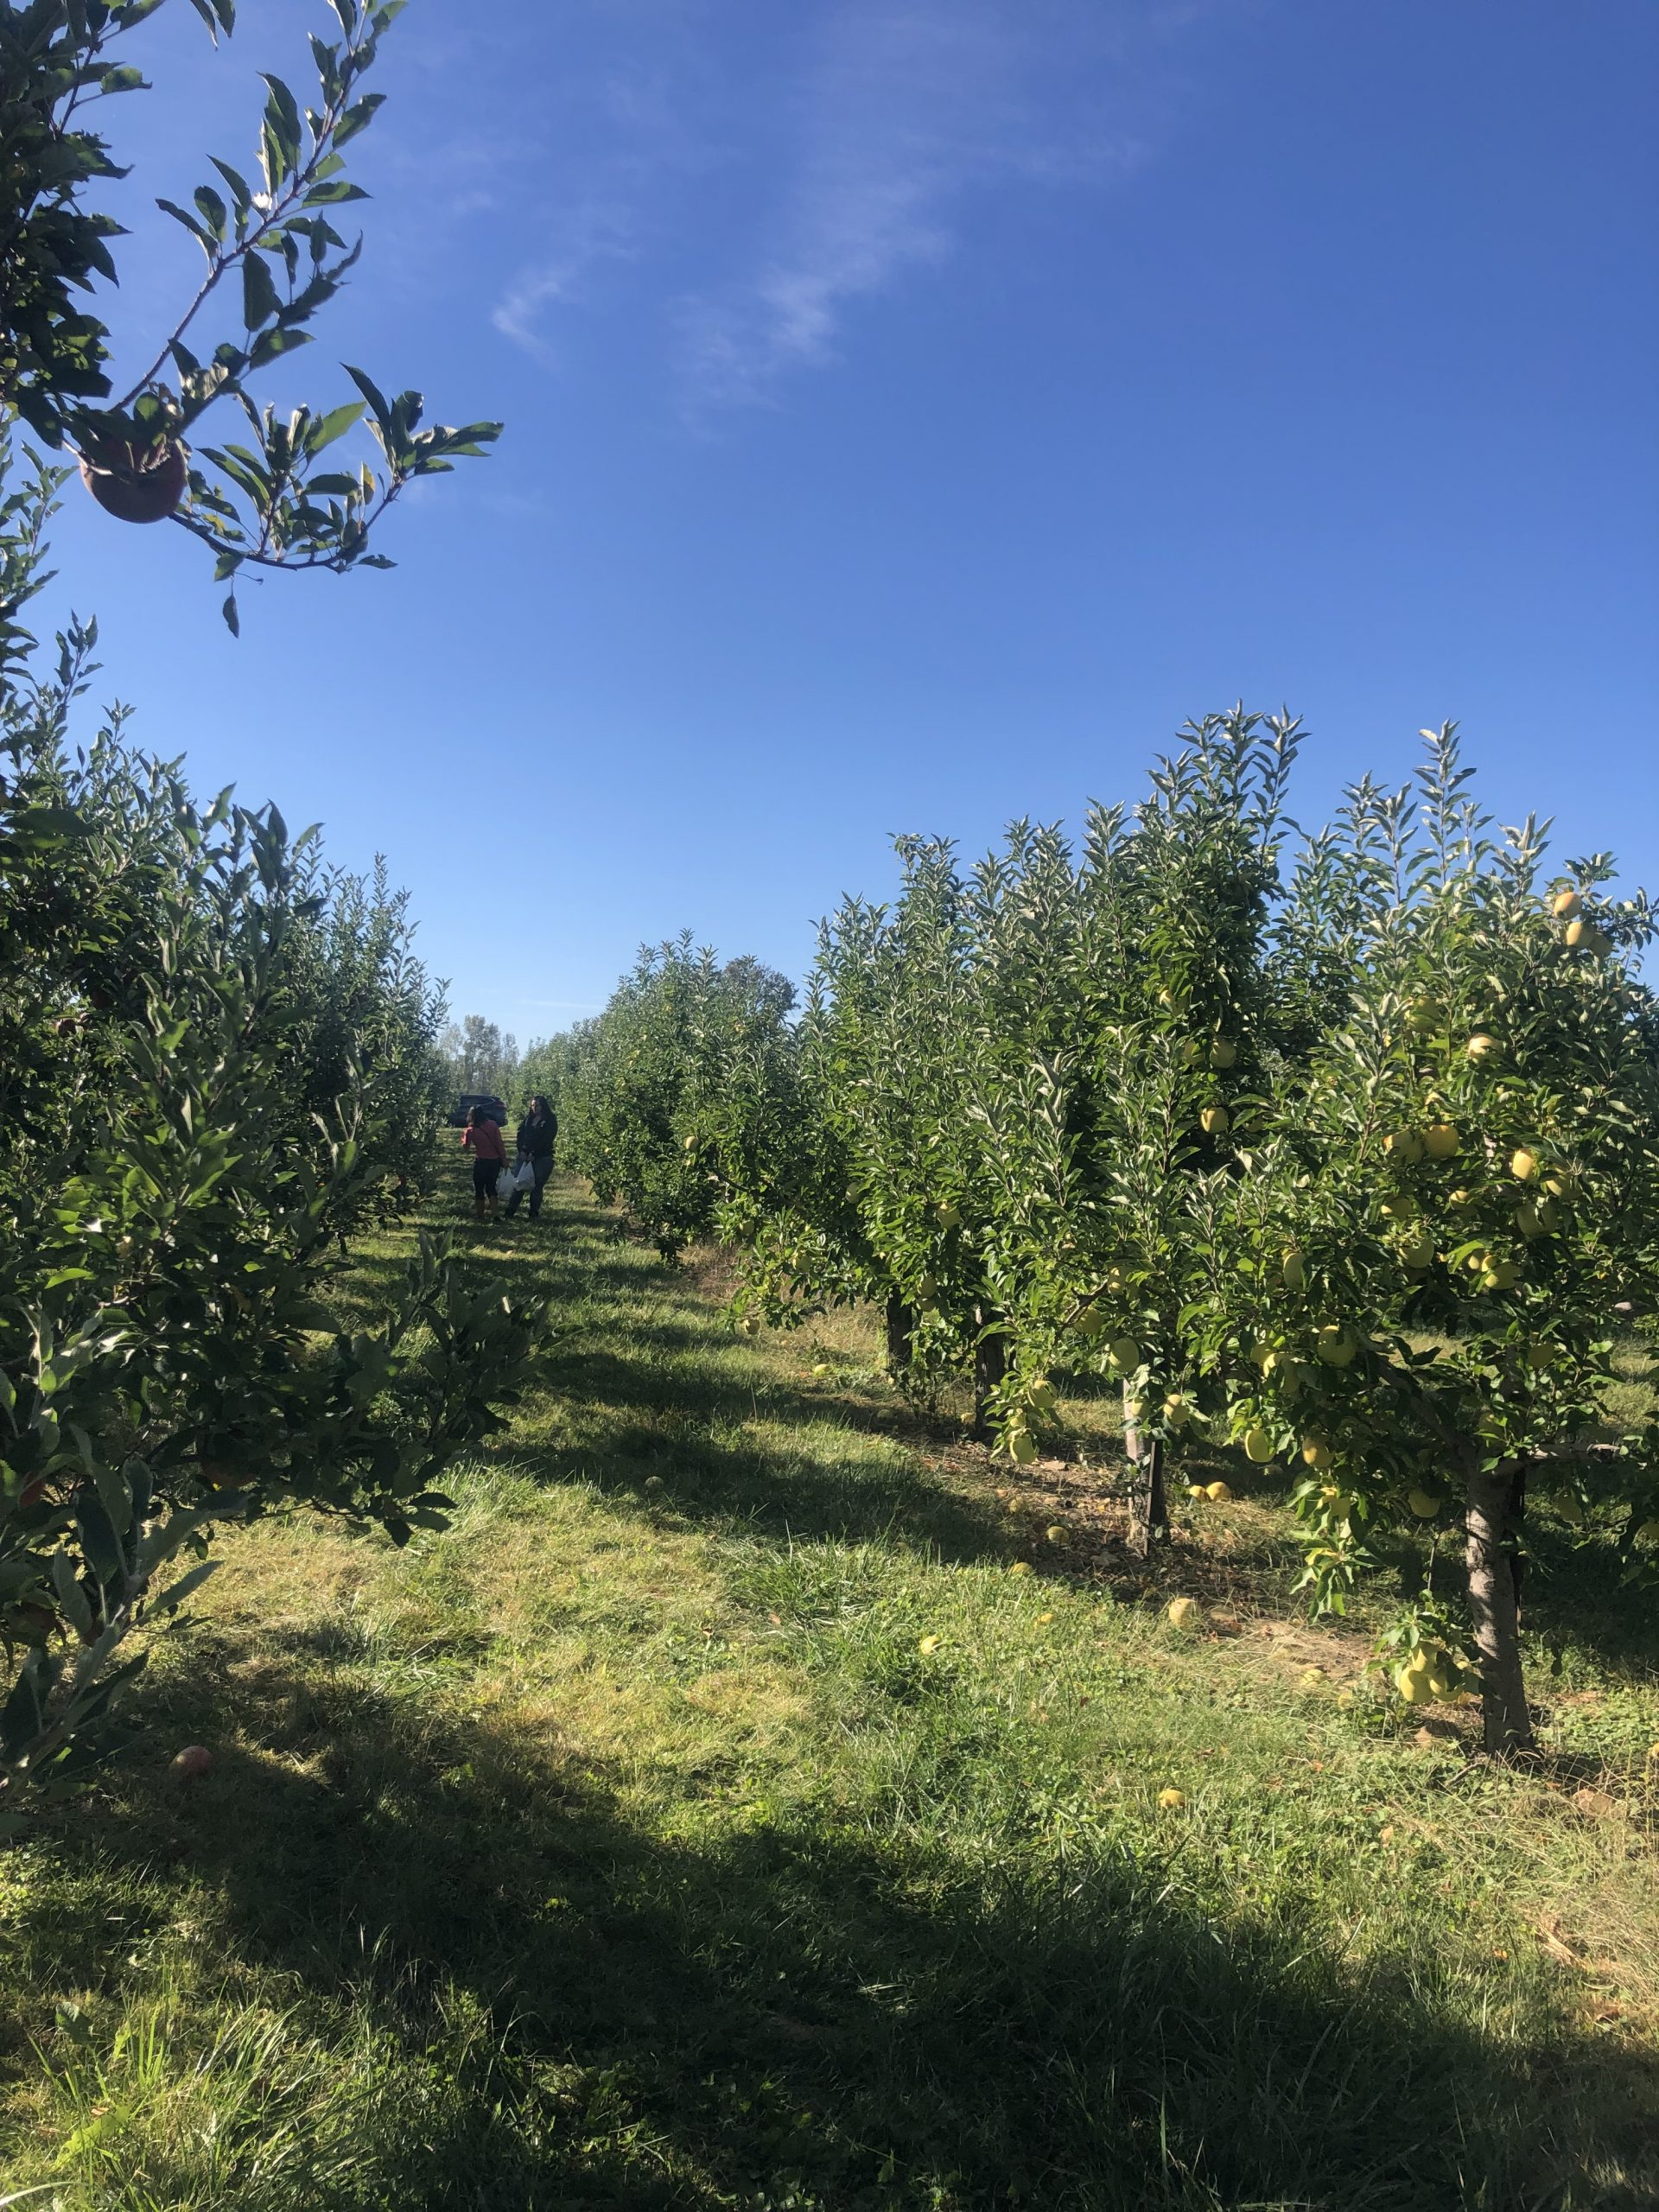 lynd's fruit farm in columbus ohio